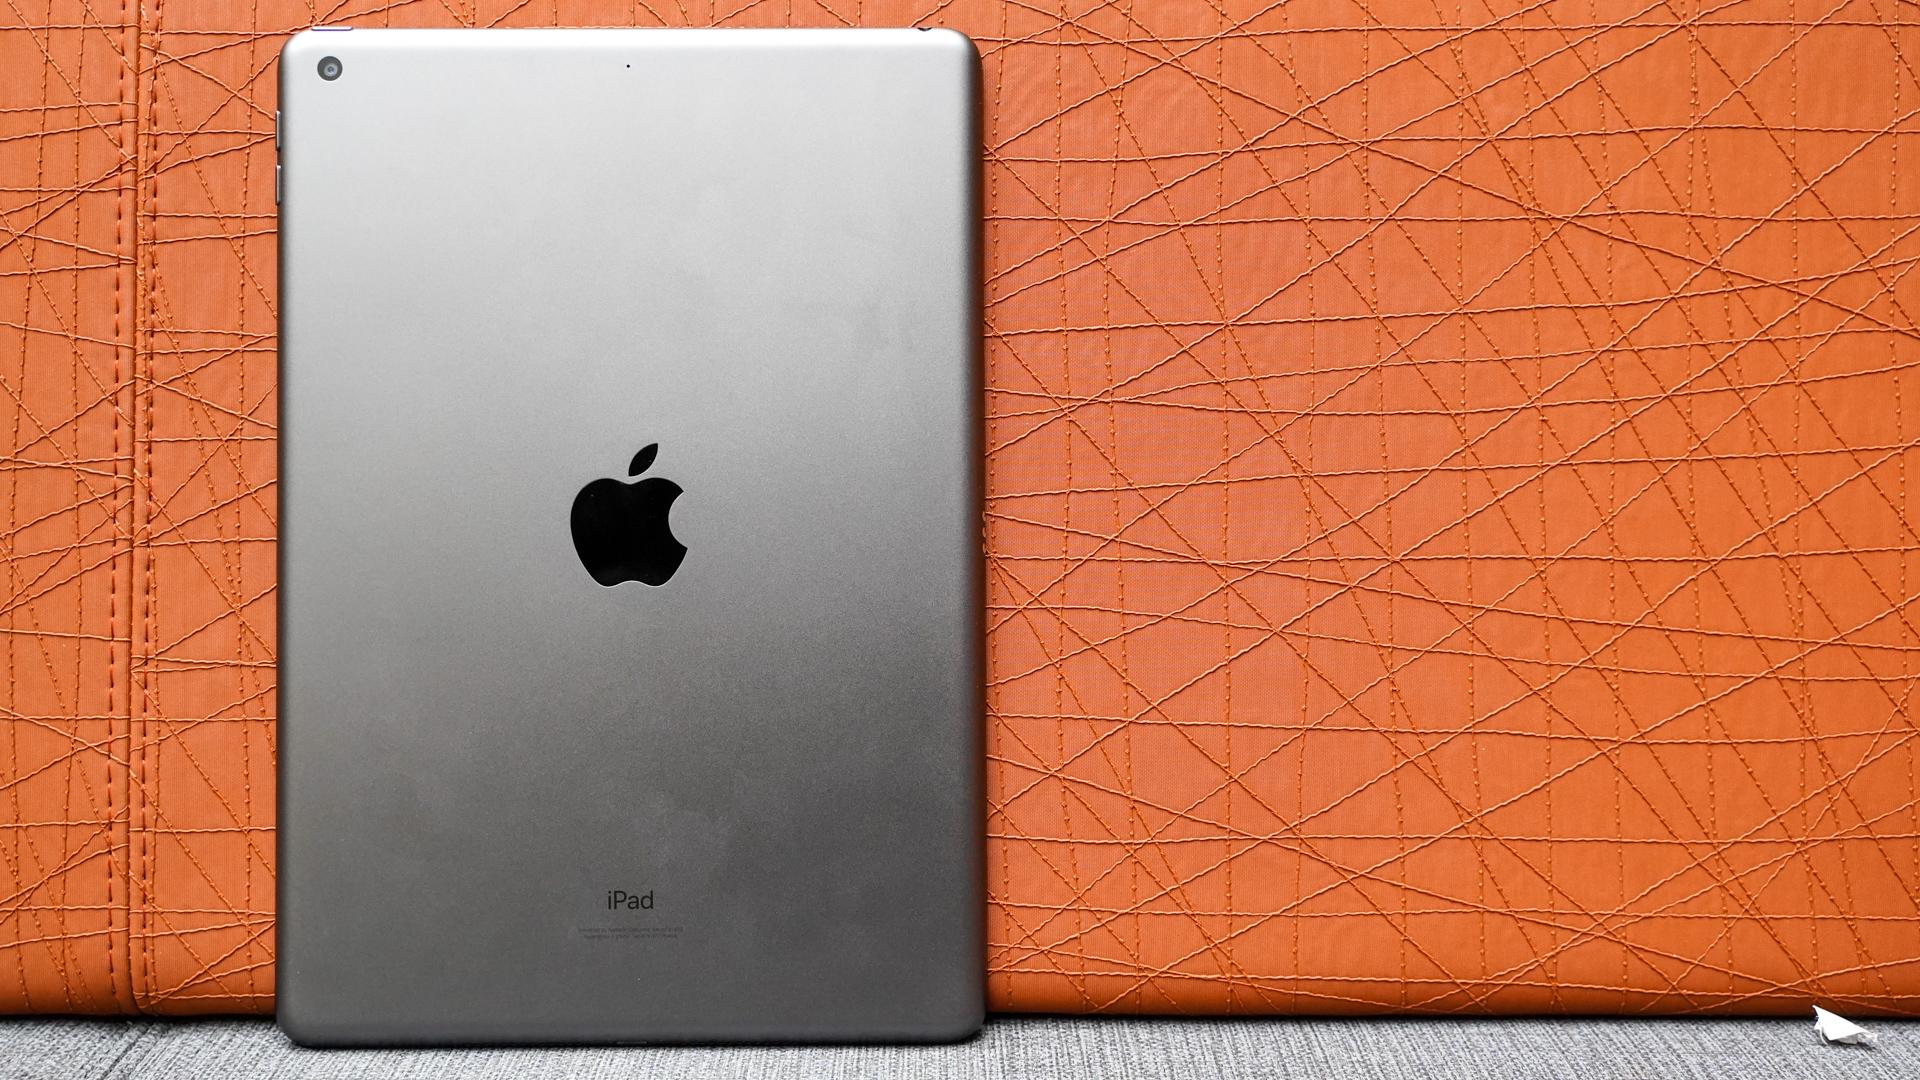 Apple iPad 2021 rear panel off center